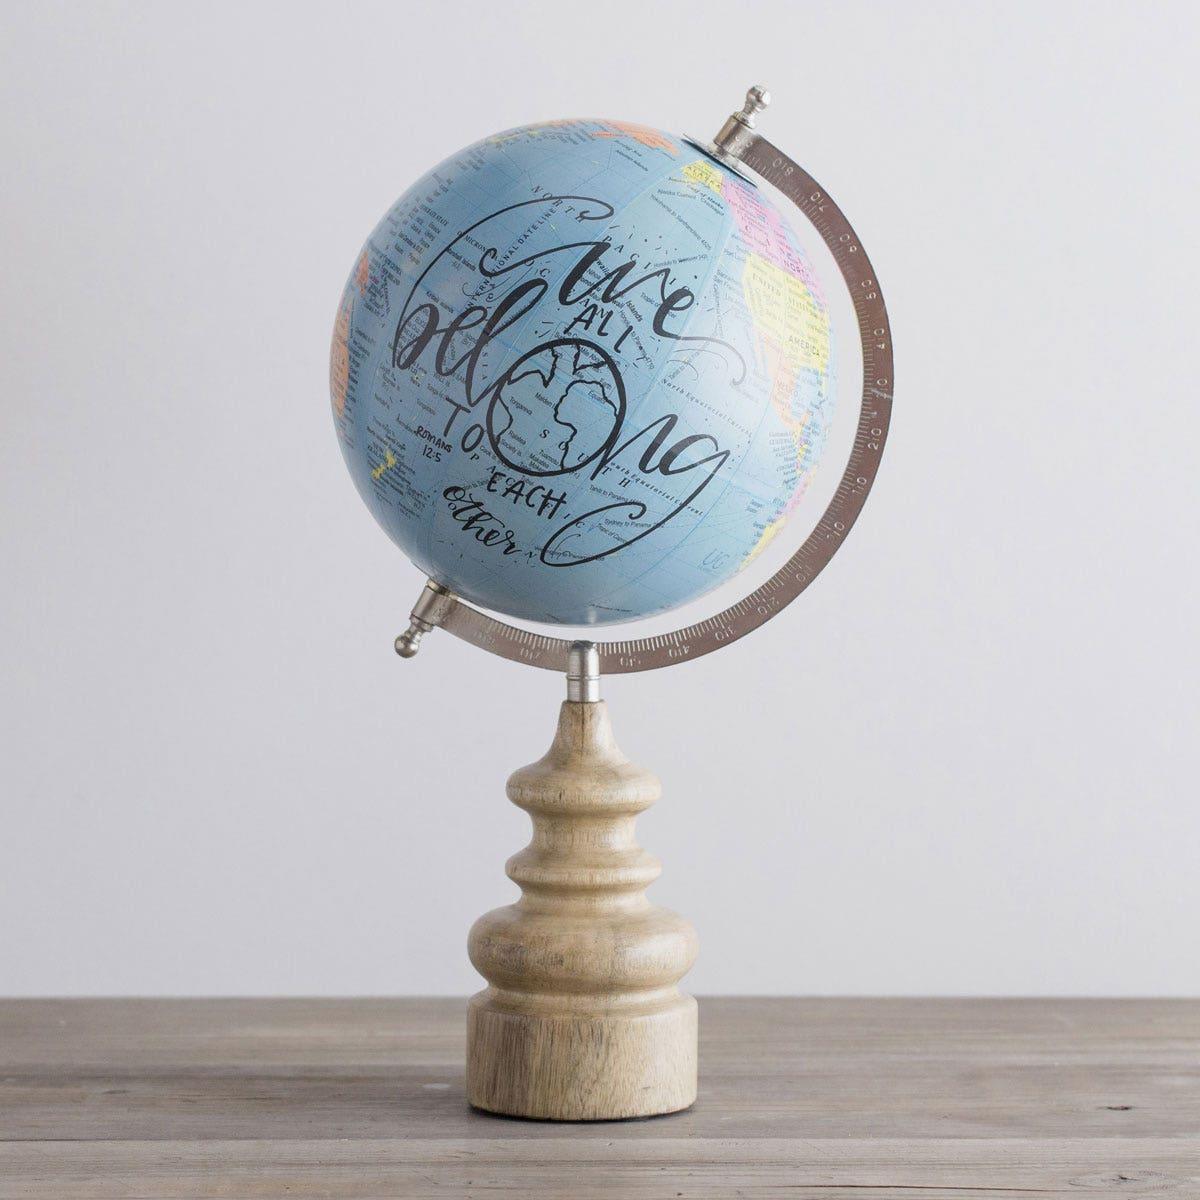 We All Belong - Inspirational Globe